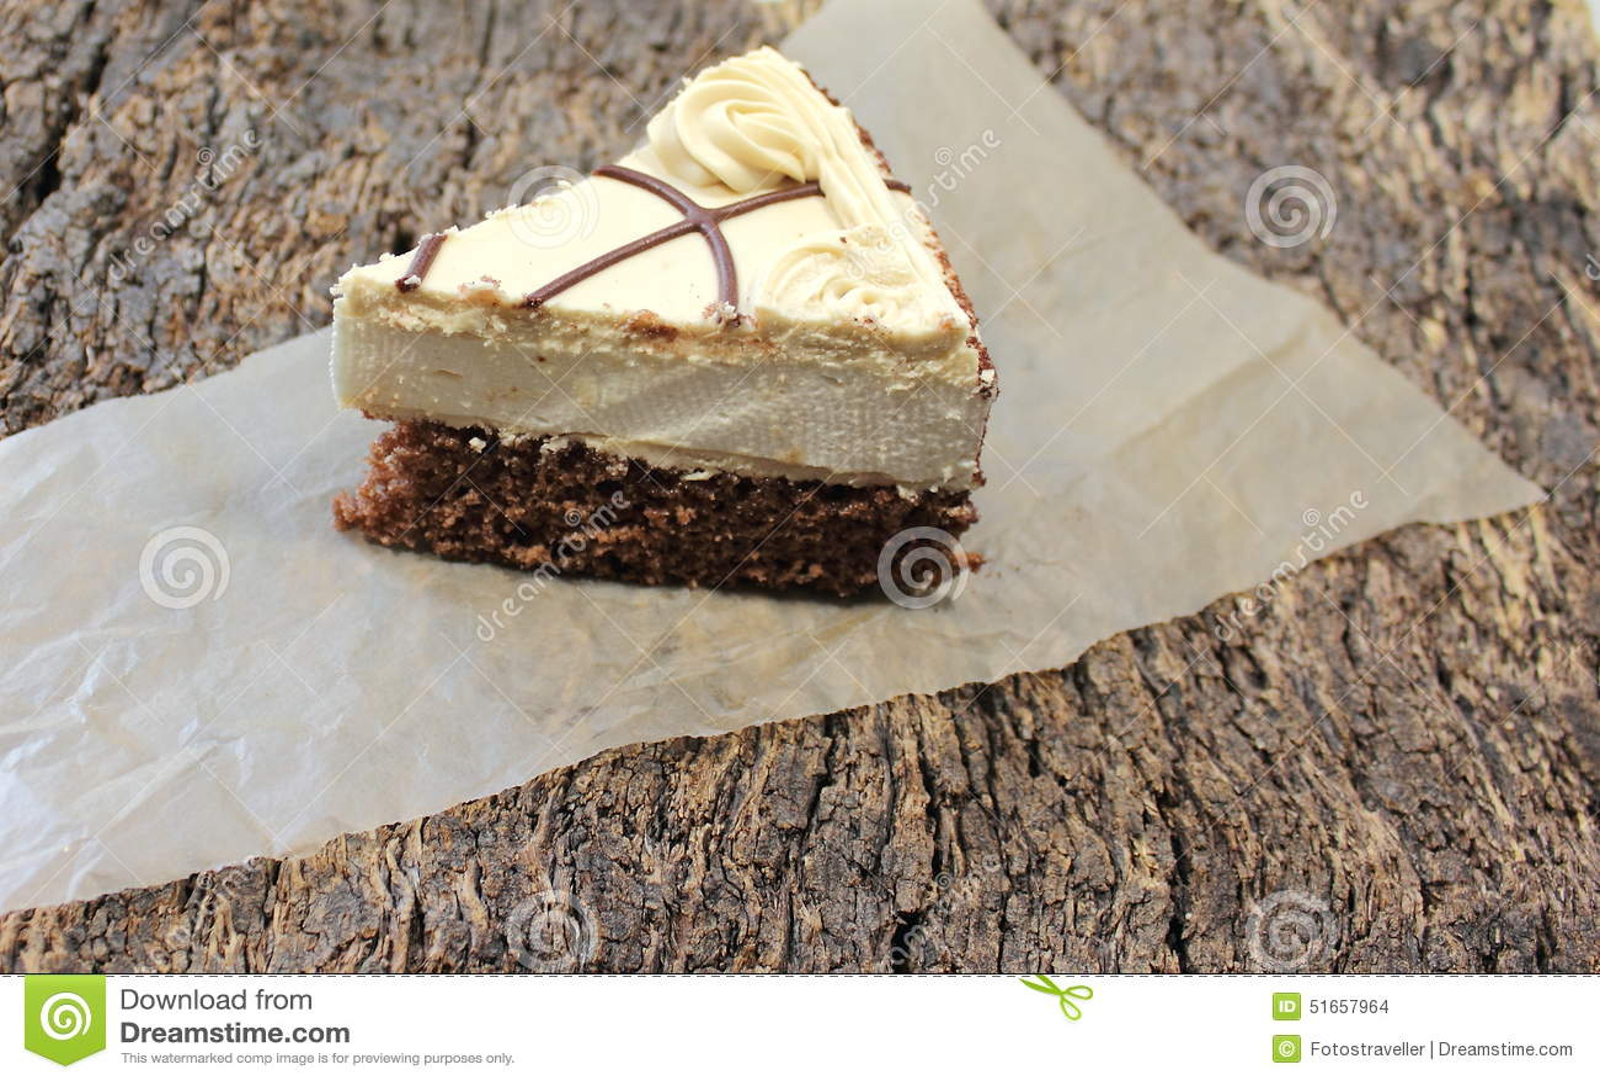 Cut A Piece Of Cake Stock Photo 51657964 - Megapixl